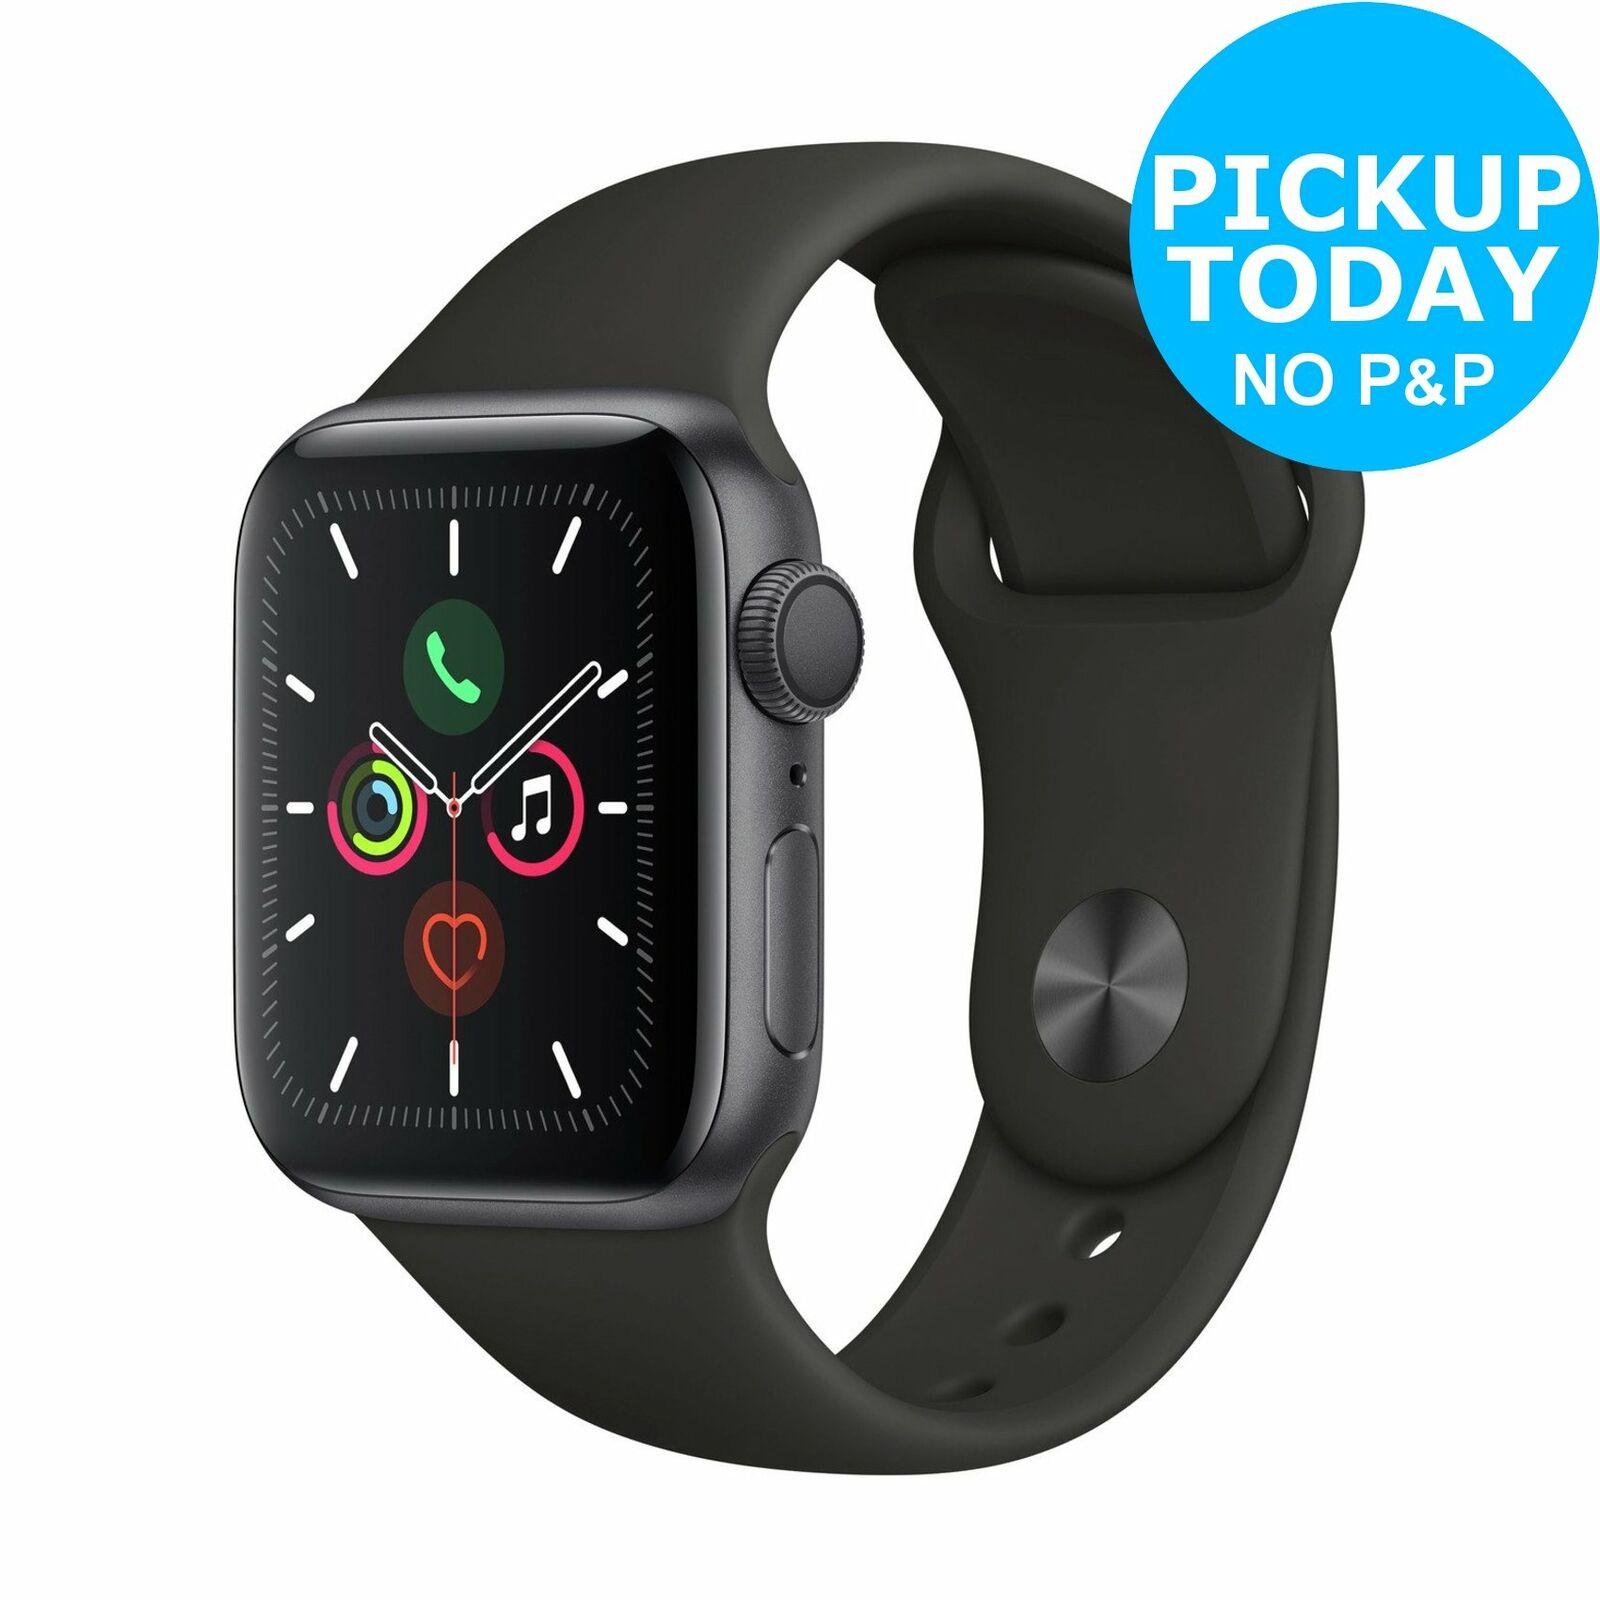 Apple Watch S5 GPS 40mm Smart Watch - Space Grey Alu/Black Band £359.10 at Argos eBay